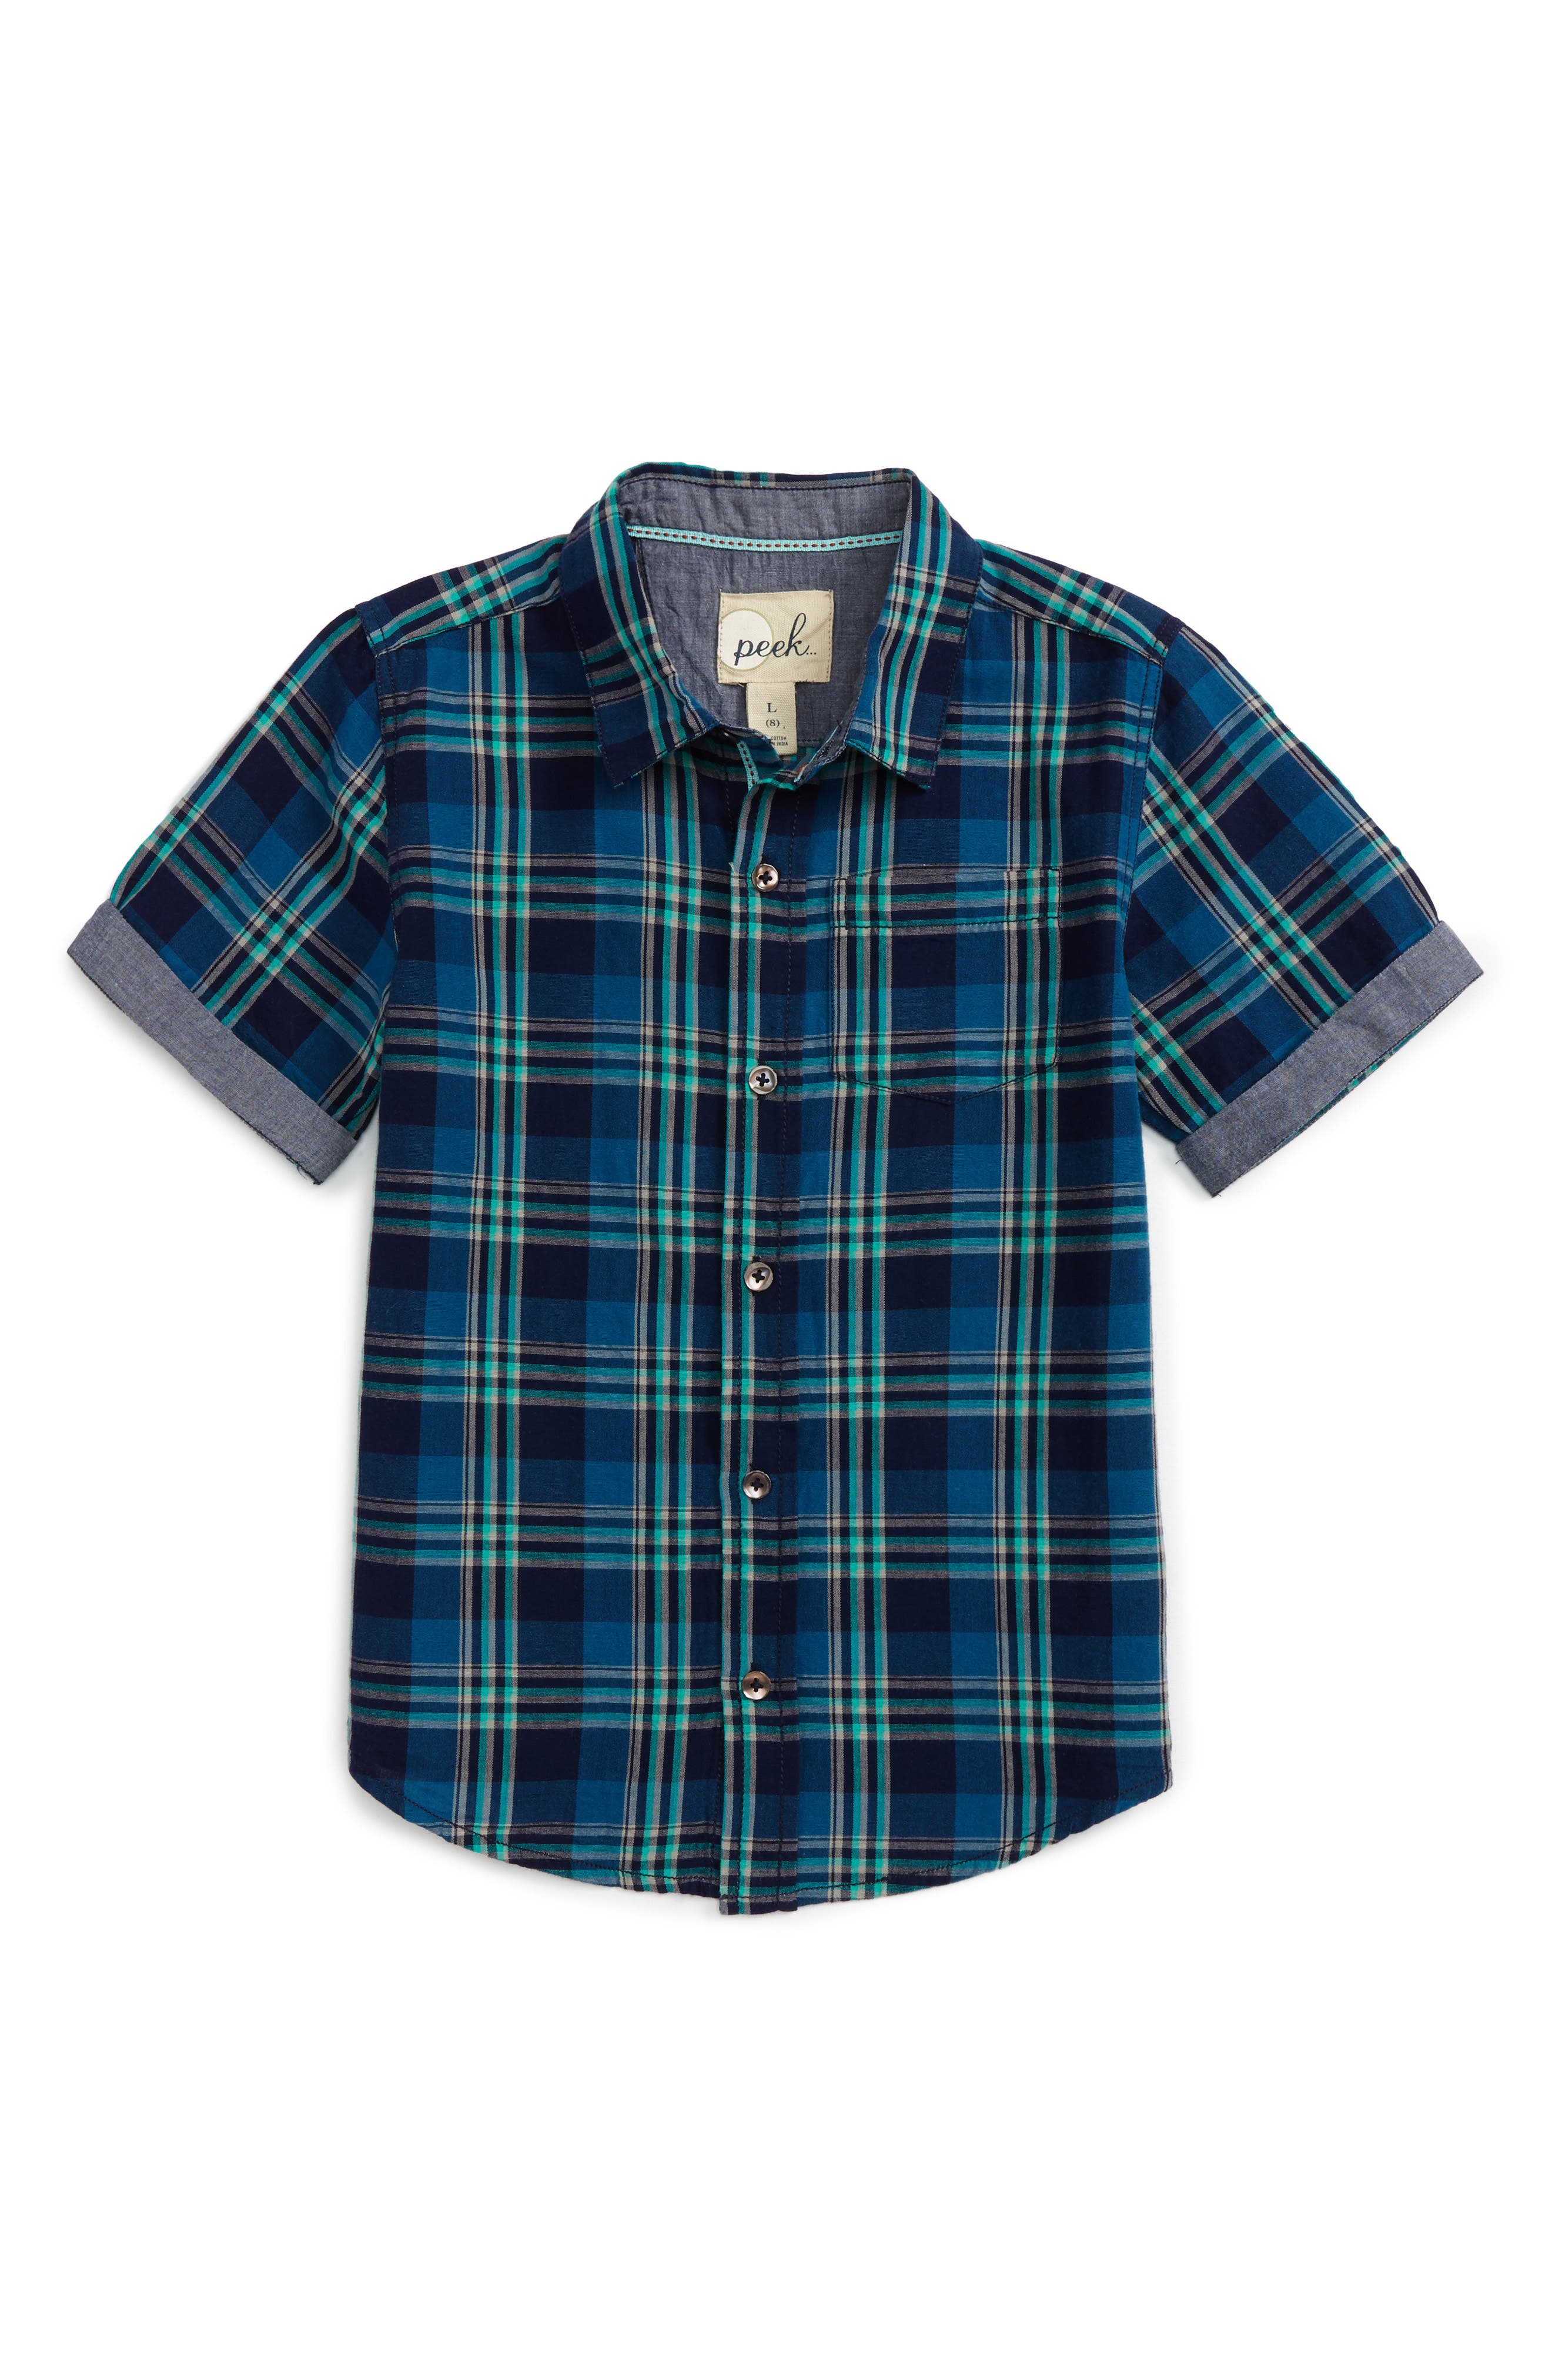 Peek Kyle Plaid Short Sleeve Woven Shirt (Toddler Boys, Little Boys & Big Boys)